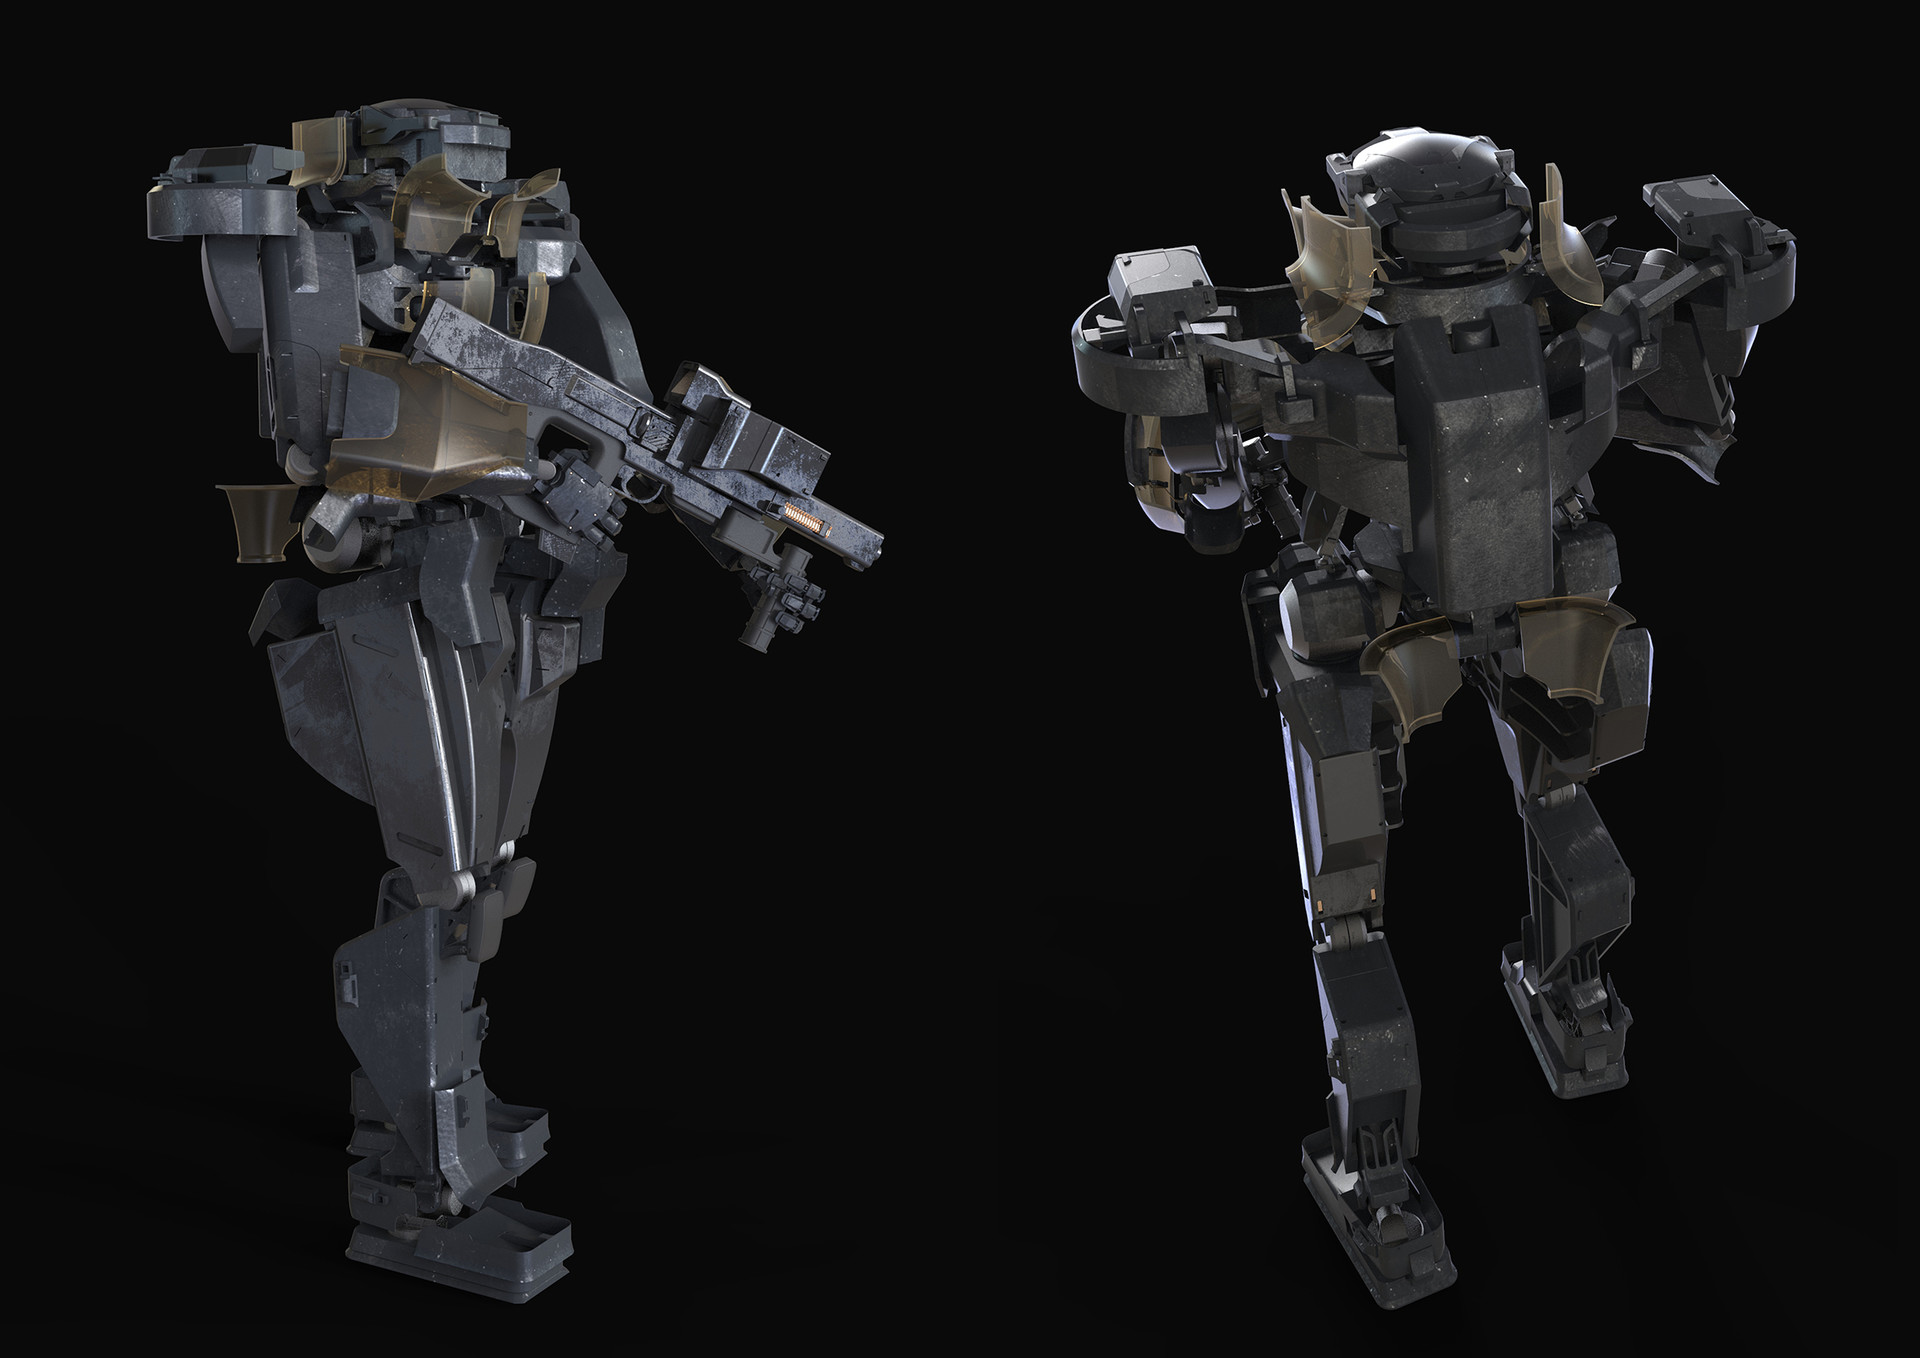 Chen liang robot 01